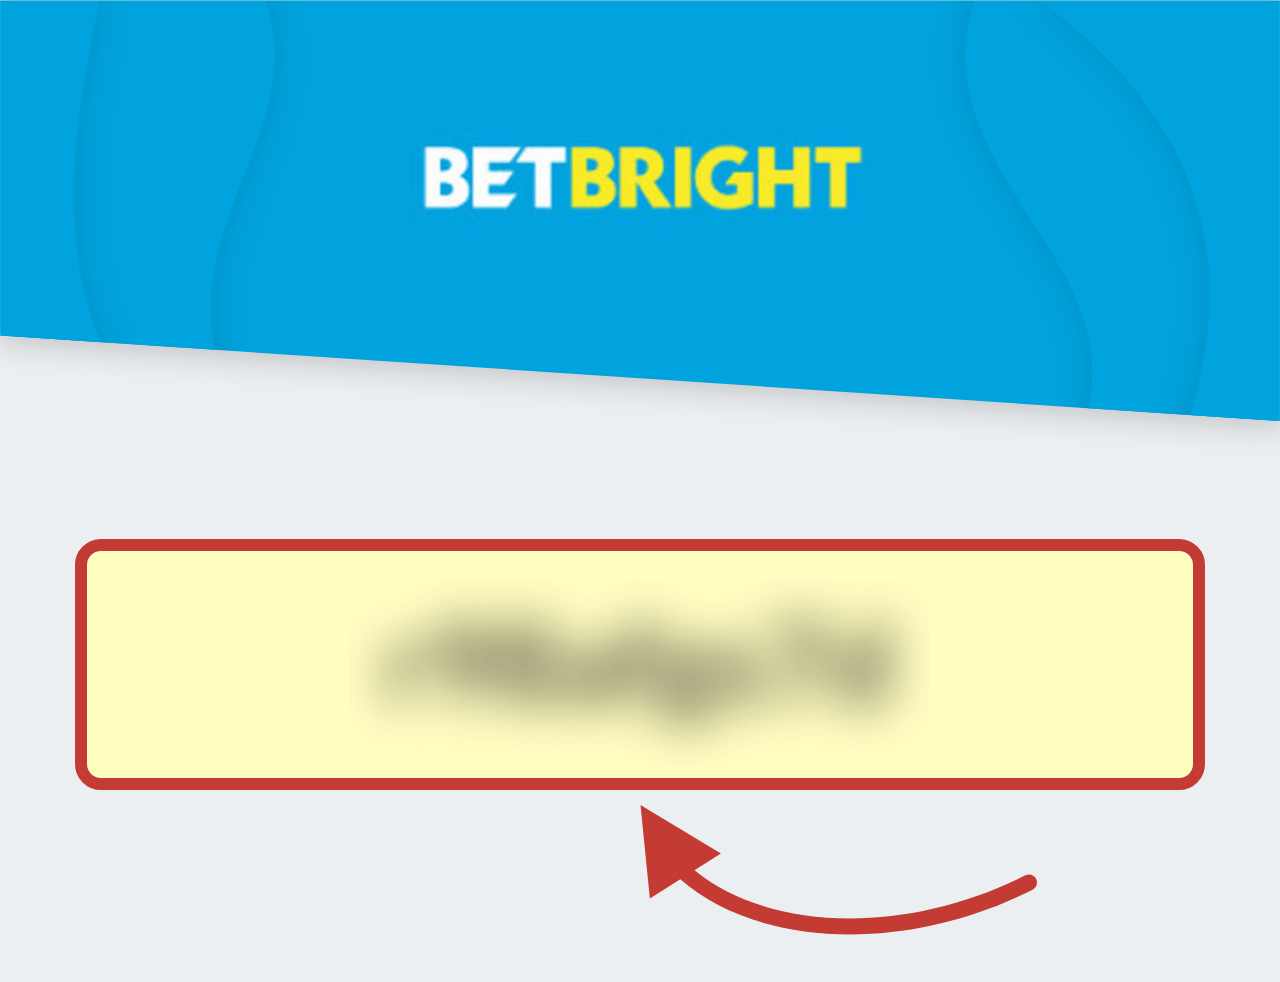 BetBright Promo Code